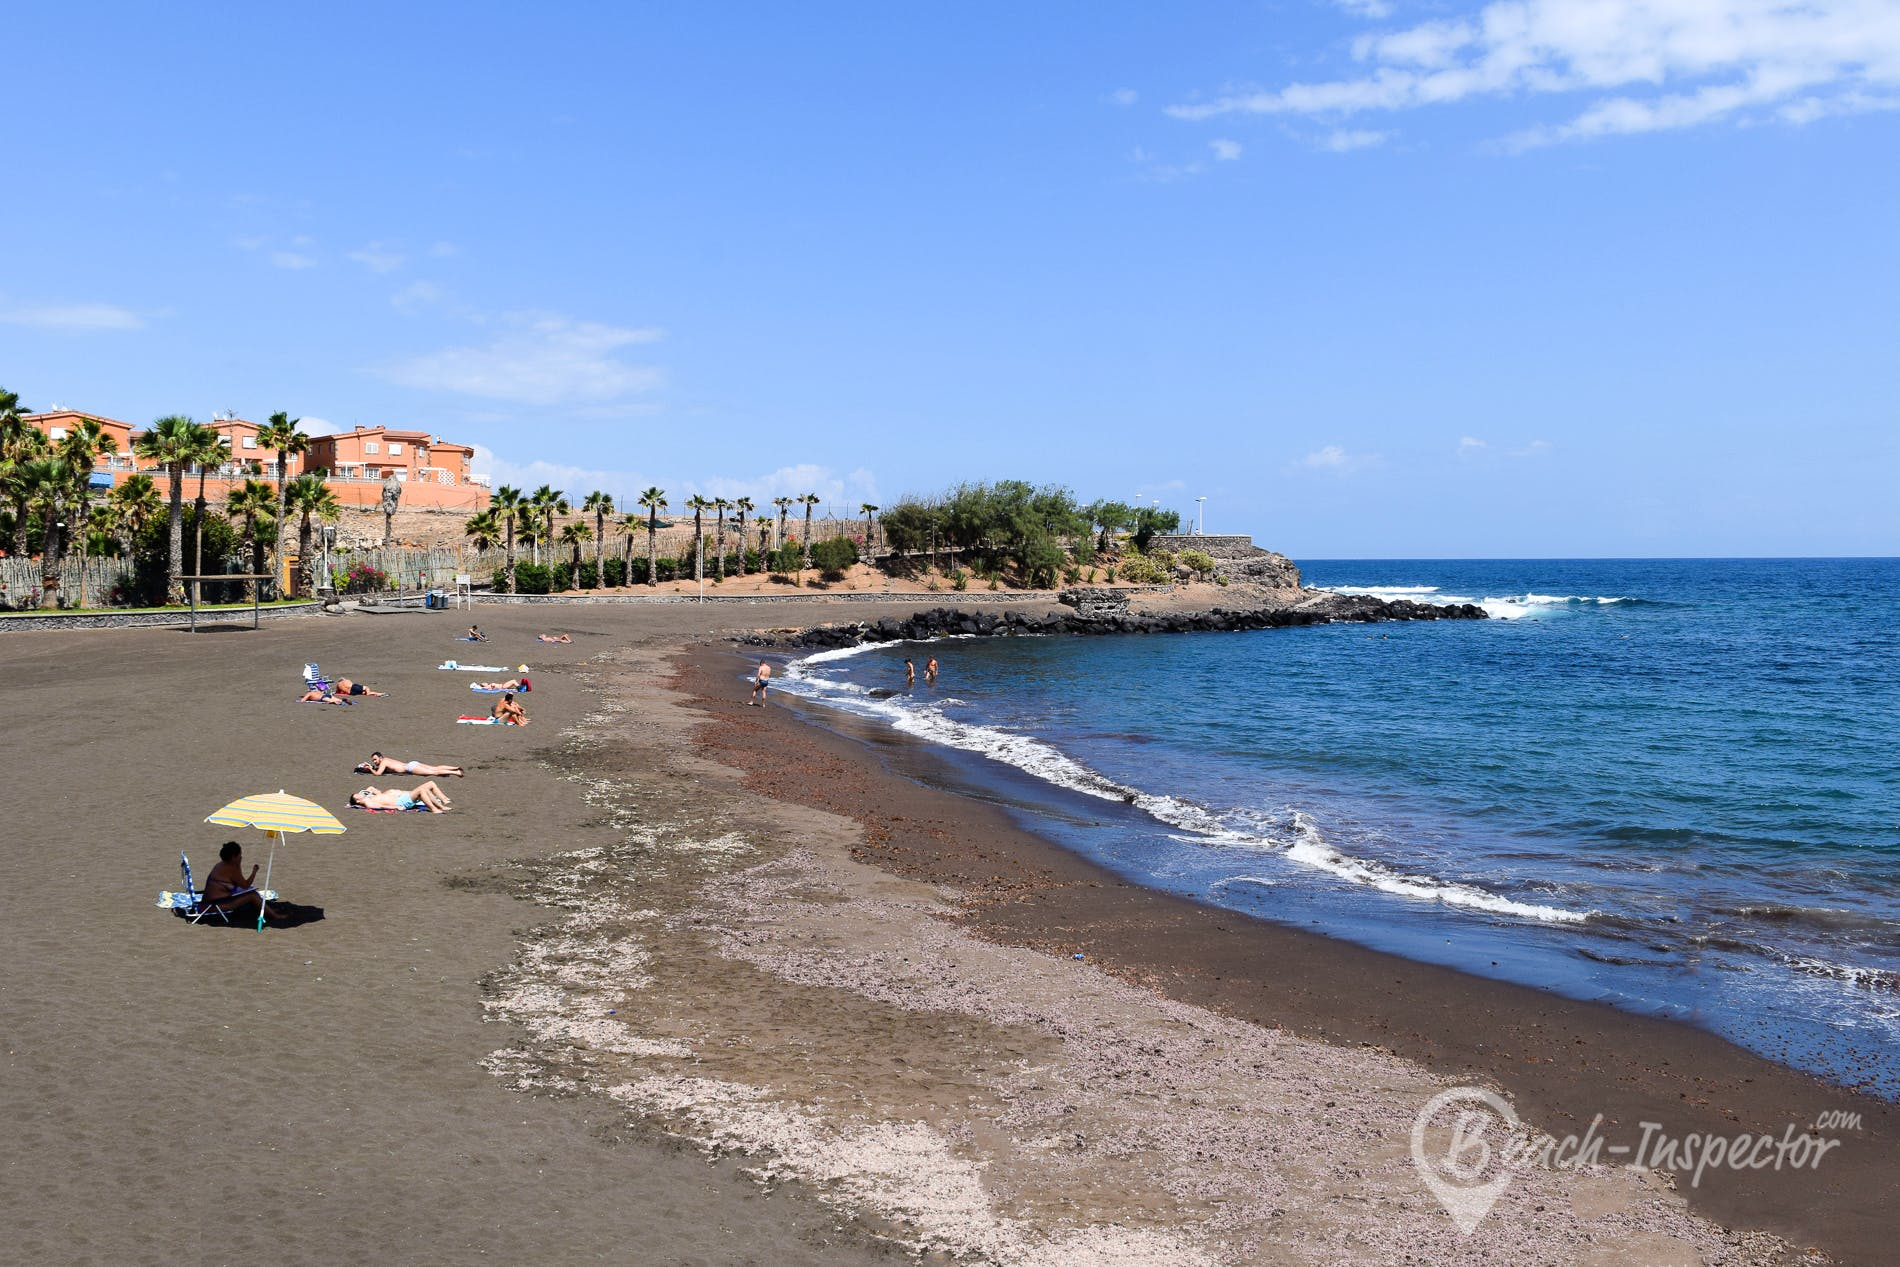 Beach Playa Hoya del Pozo, Gran Canaria, Spain